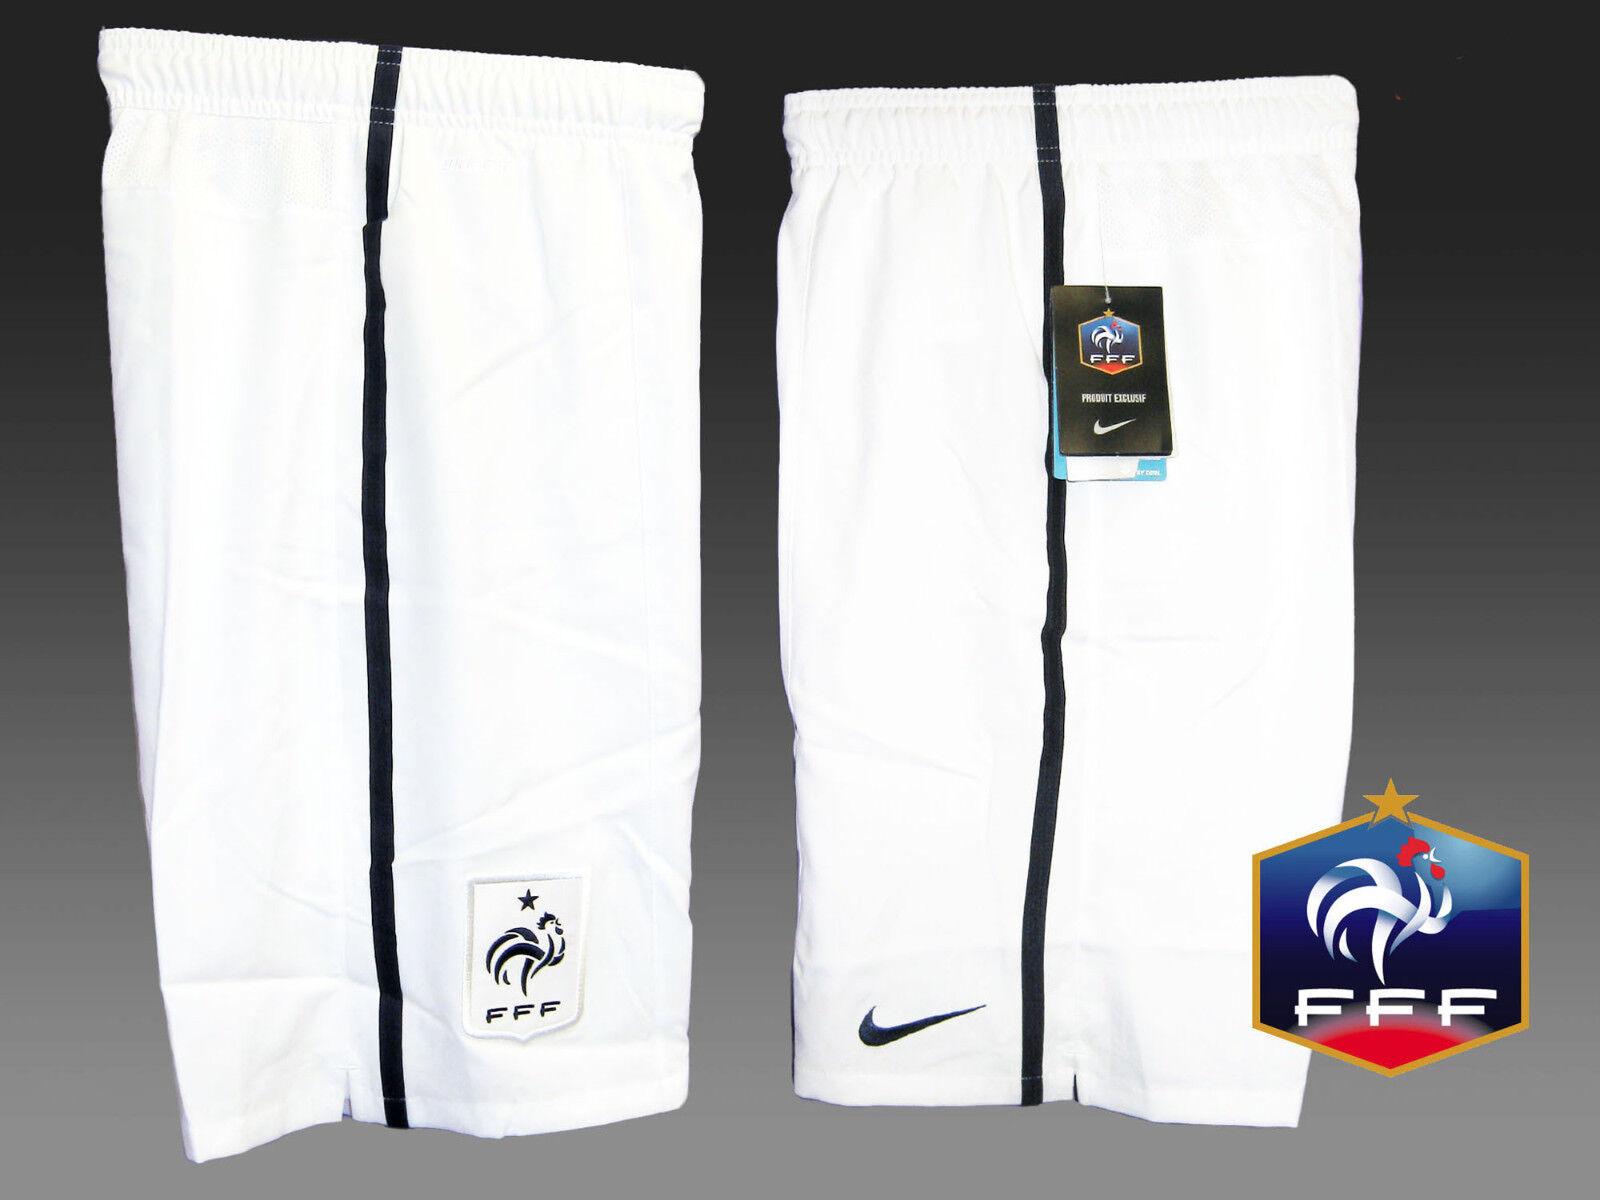 New NIKE FRANCE Federation Shorts White Youth Boys Girls M Age 10-12 Yrs